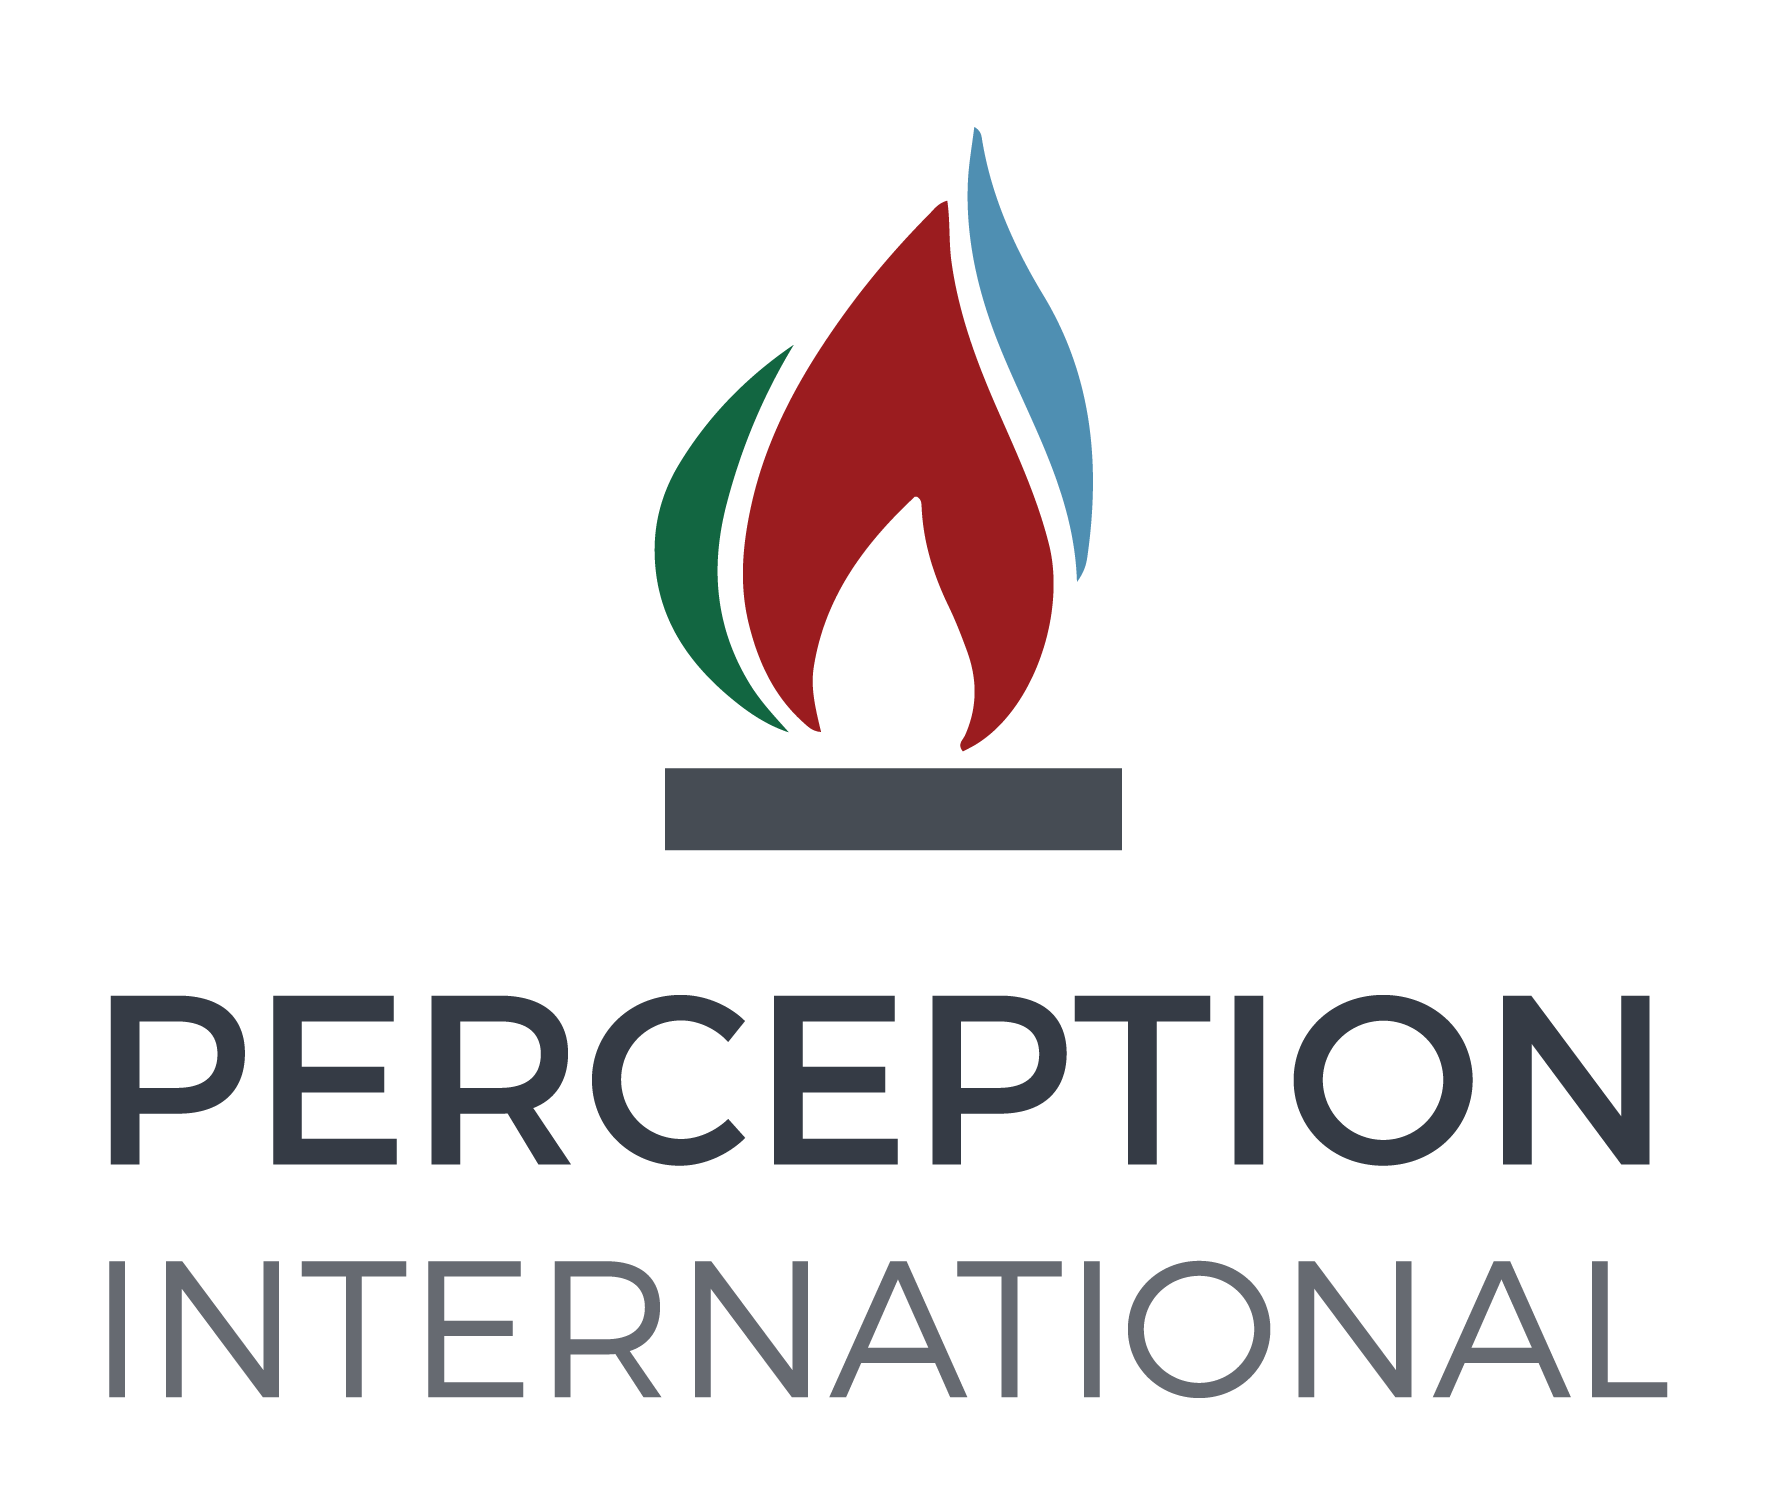 Perception International